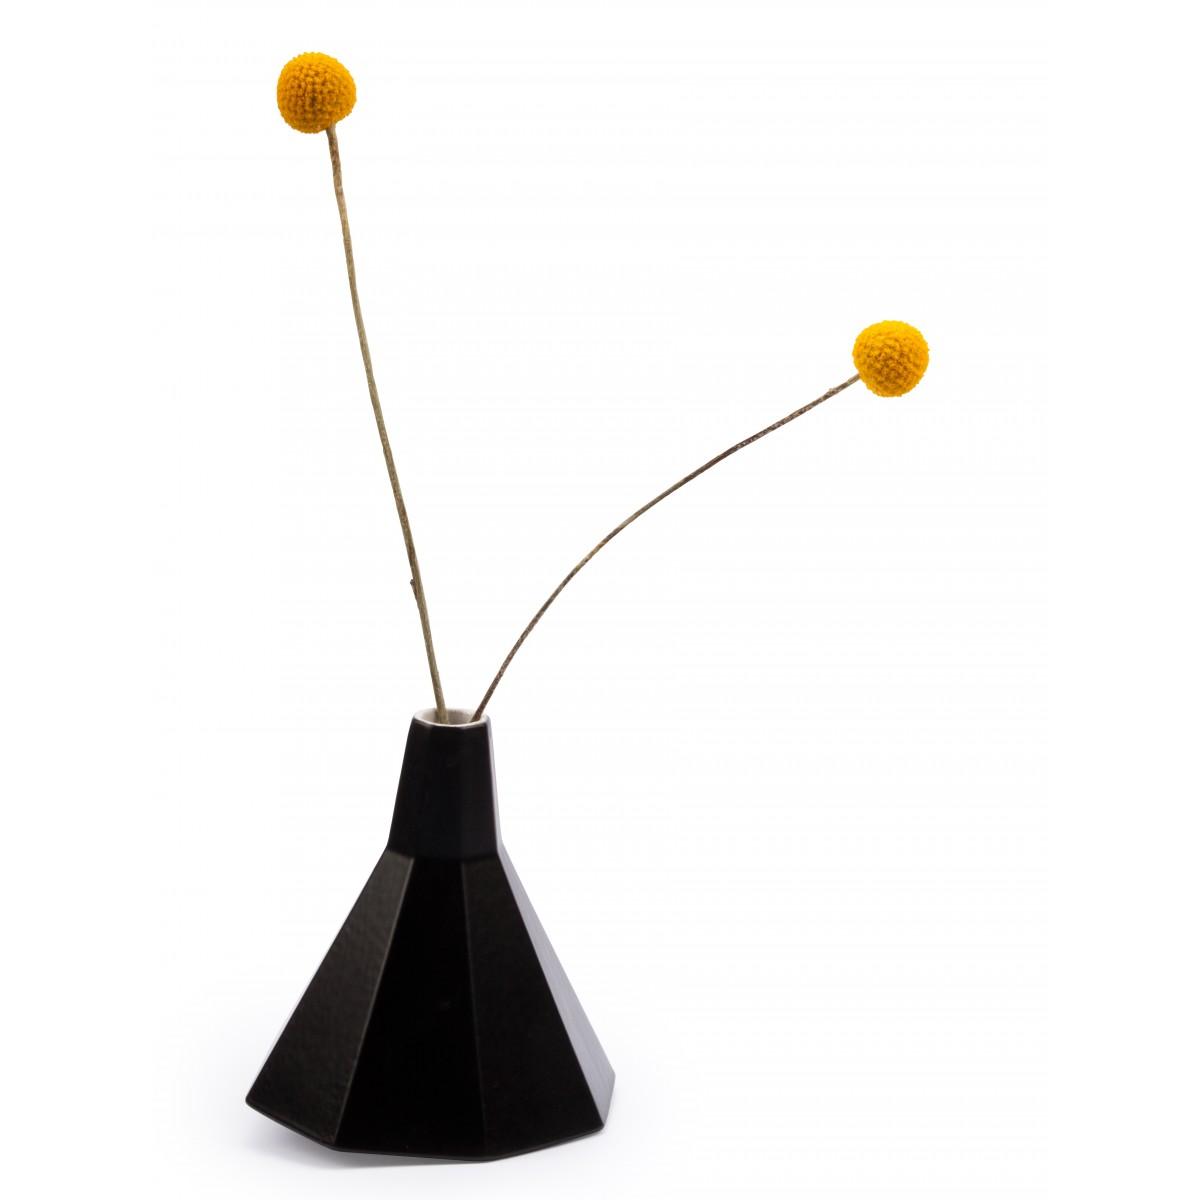 MÜLLERNKONTOR Gemini Vase